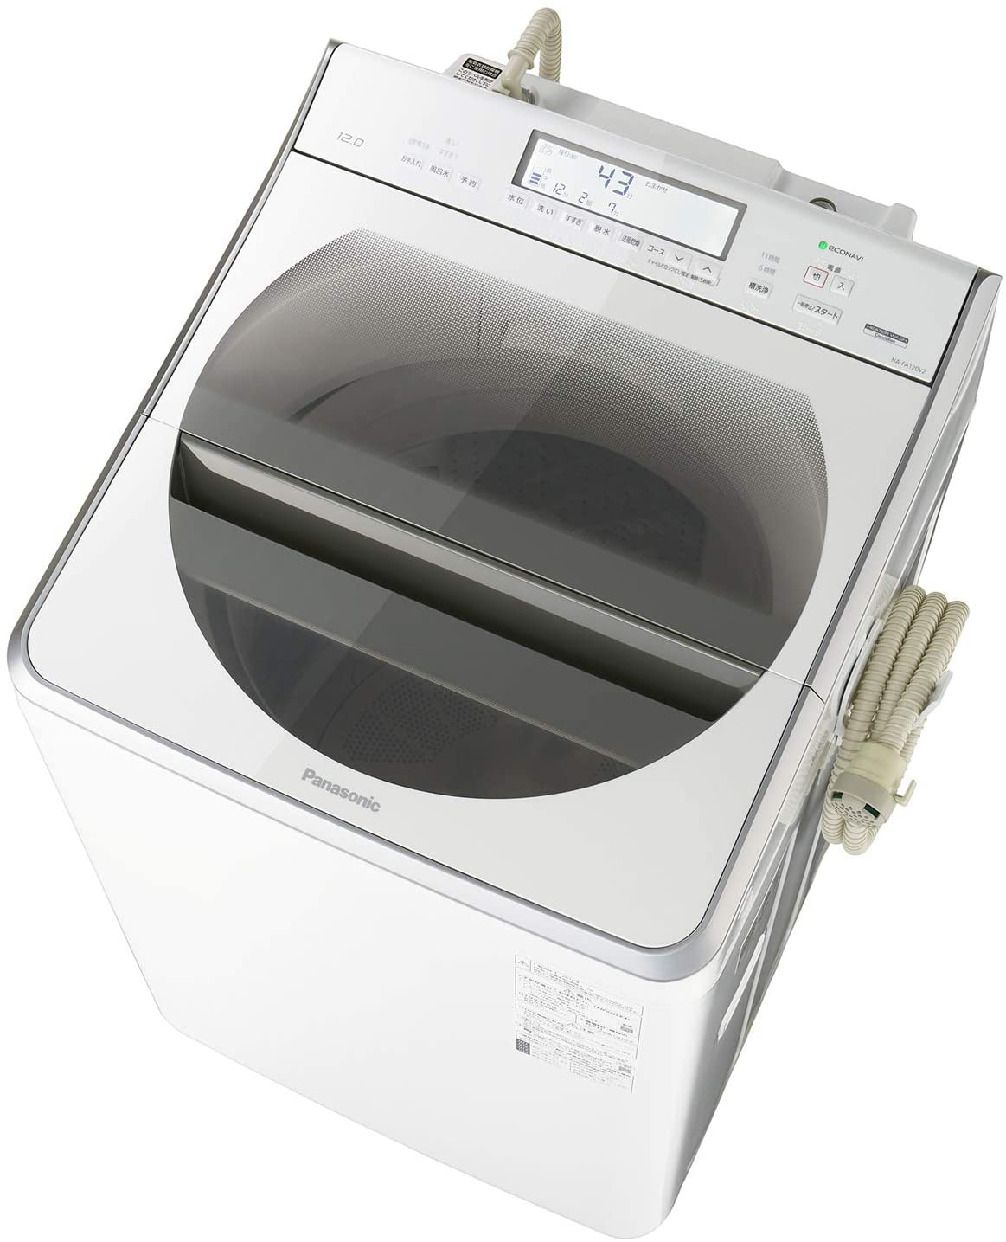 Panasonic(パナソニック) 全自動洗濯機 NA-FA120V2の商品画像2